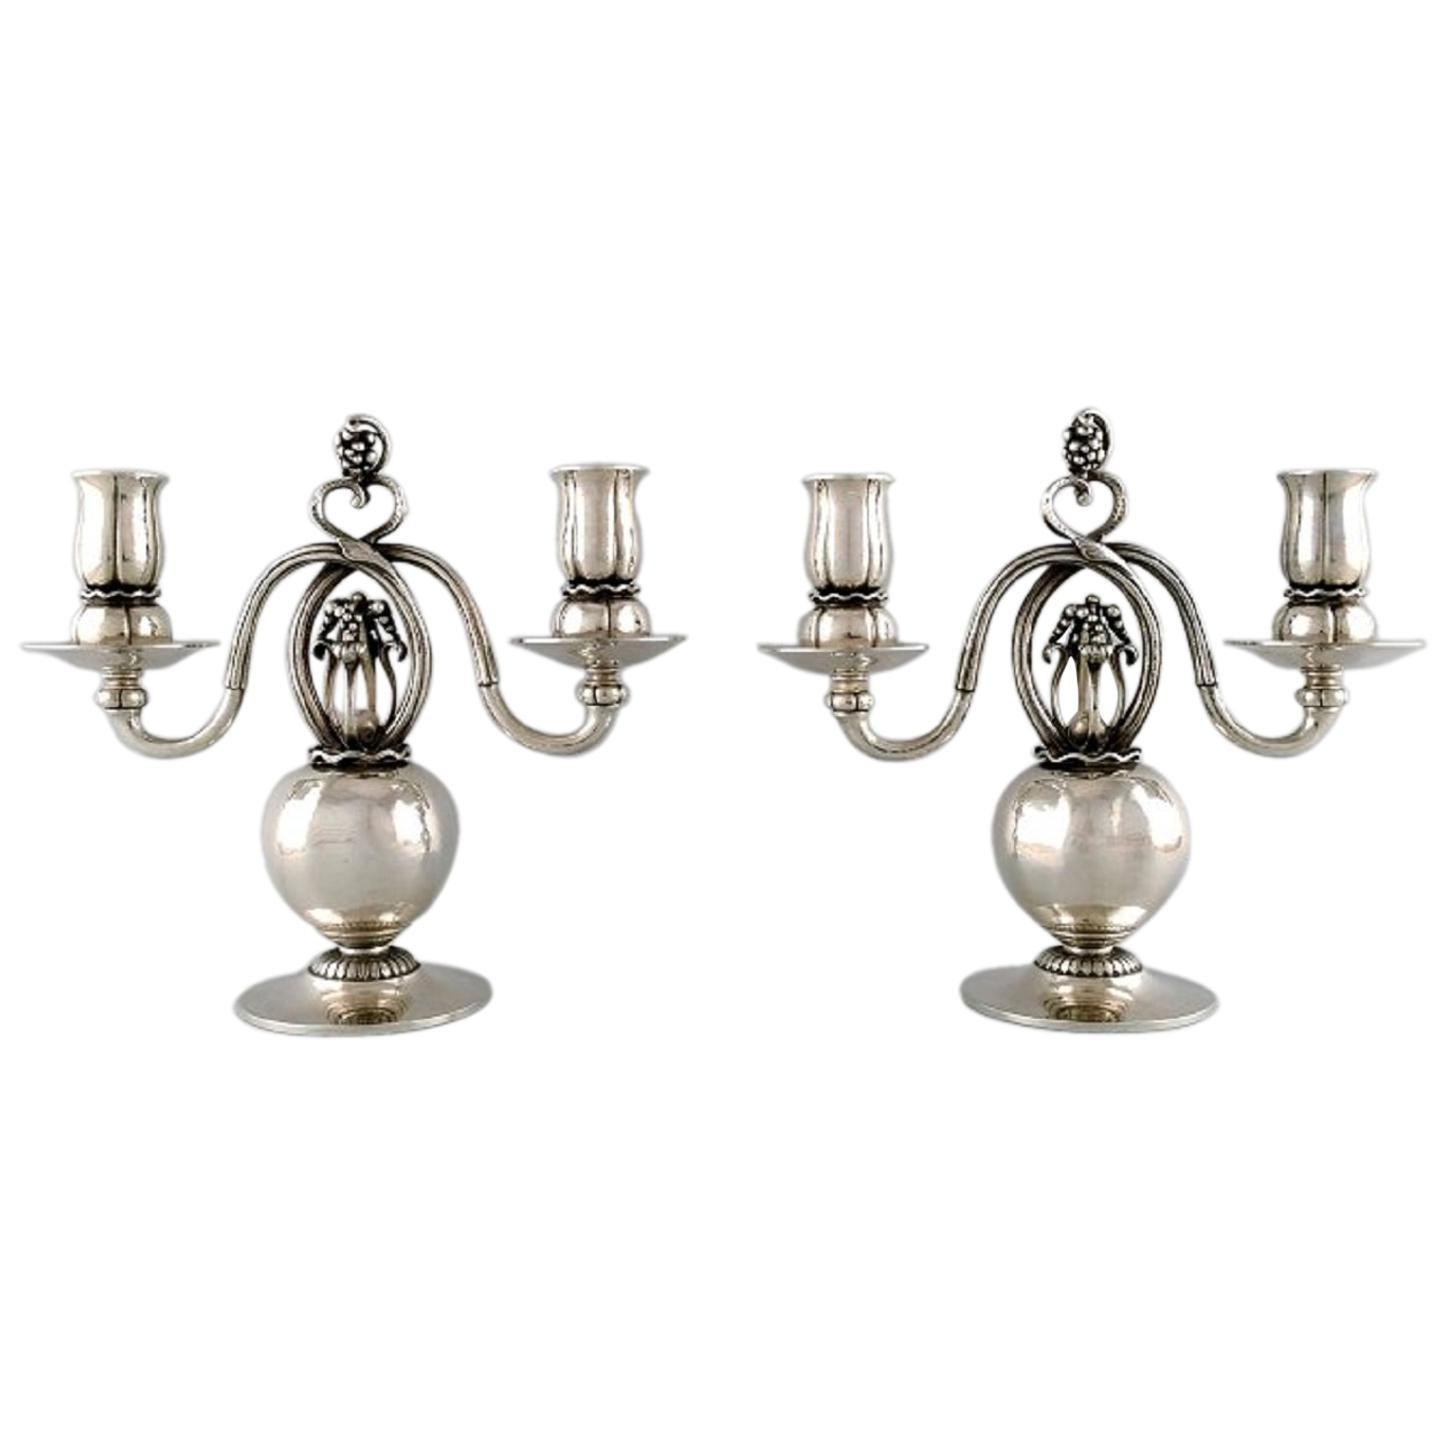 Pair of Danish Silver Two-Light Candelabras, Designed by Georg Jensen